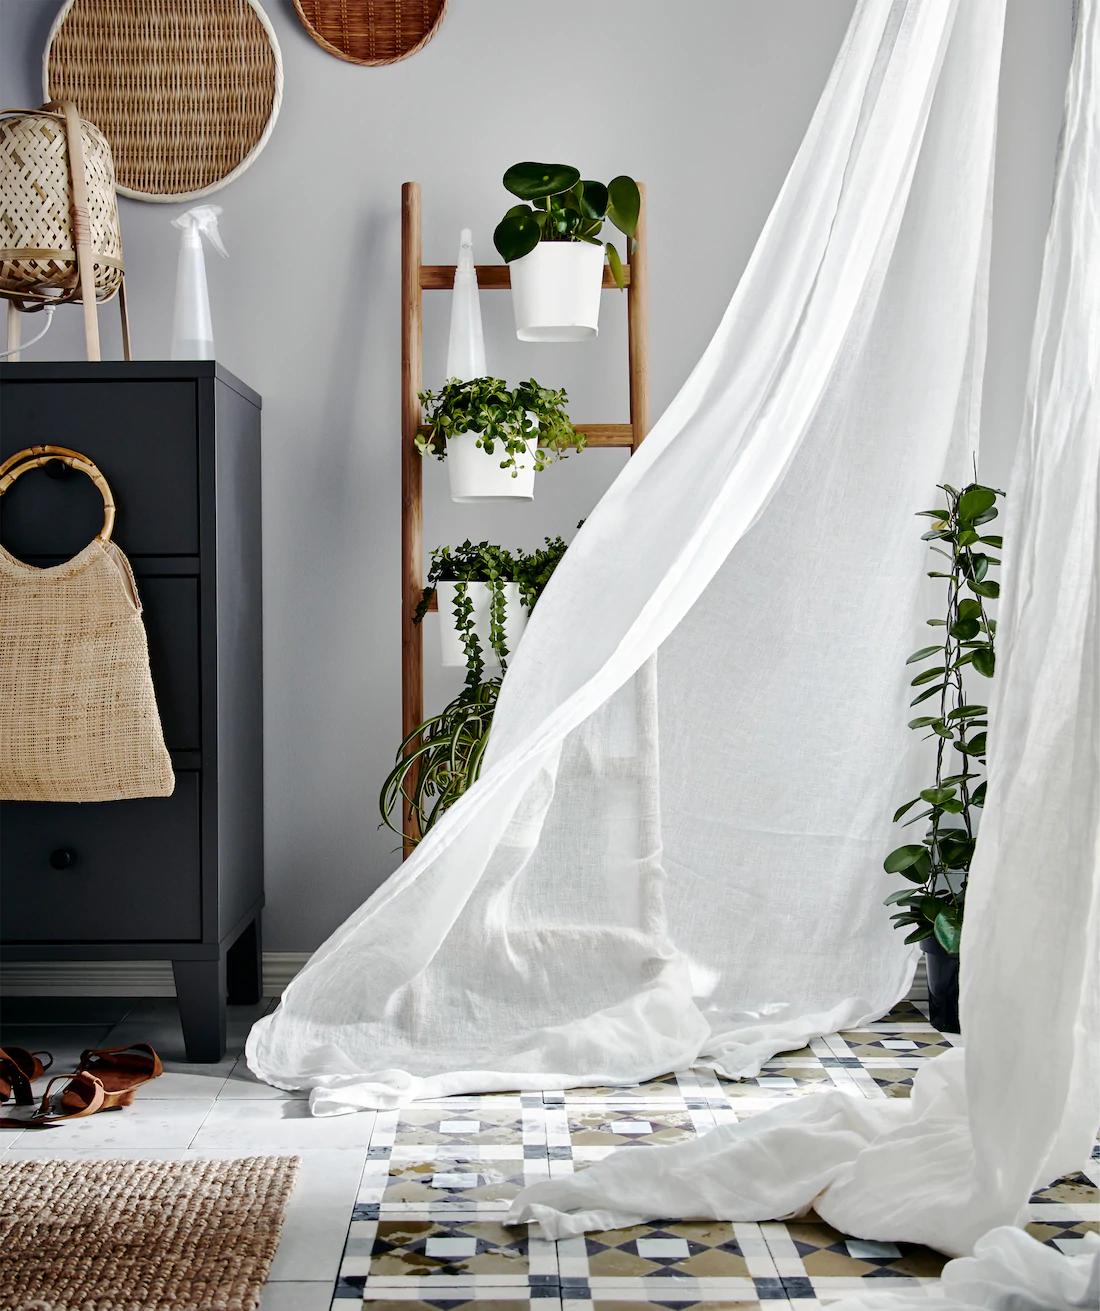 Mist curtains IKEA keep HDB cool